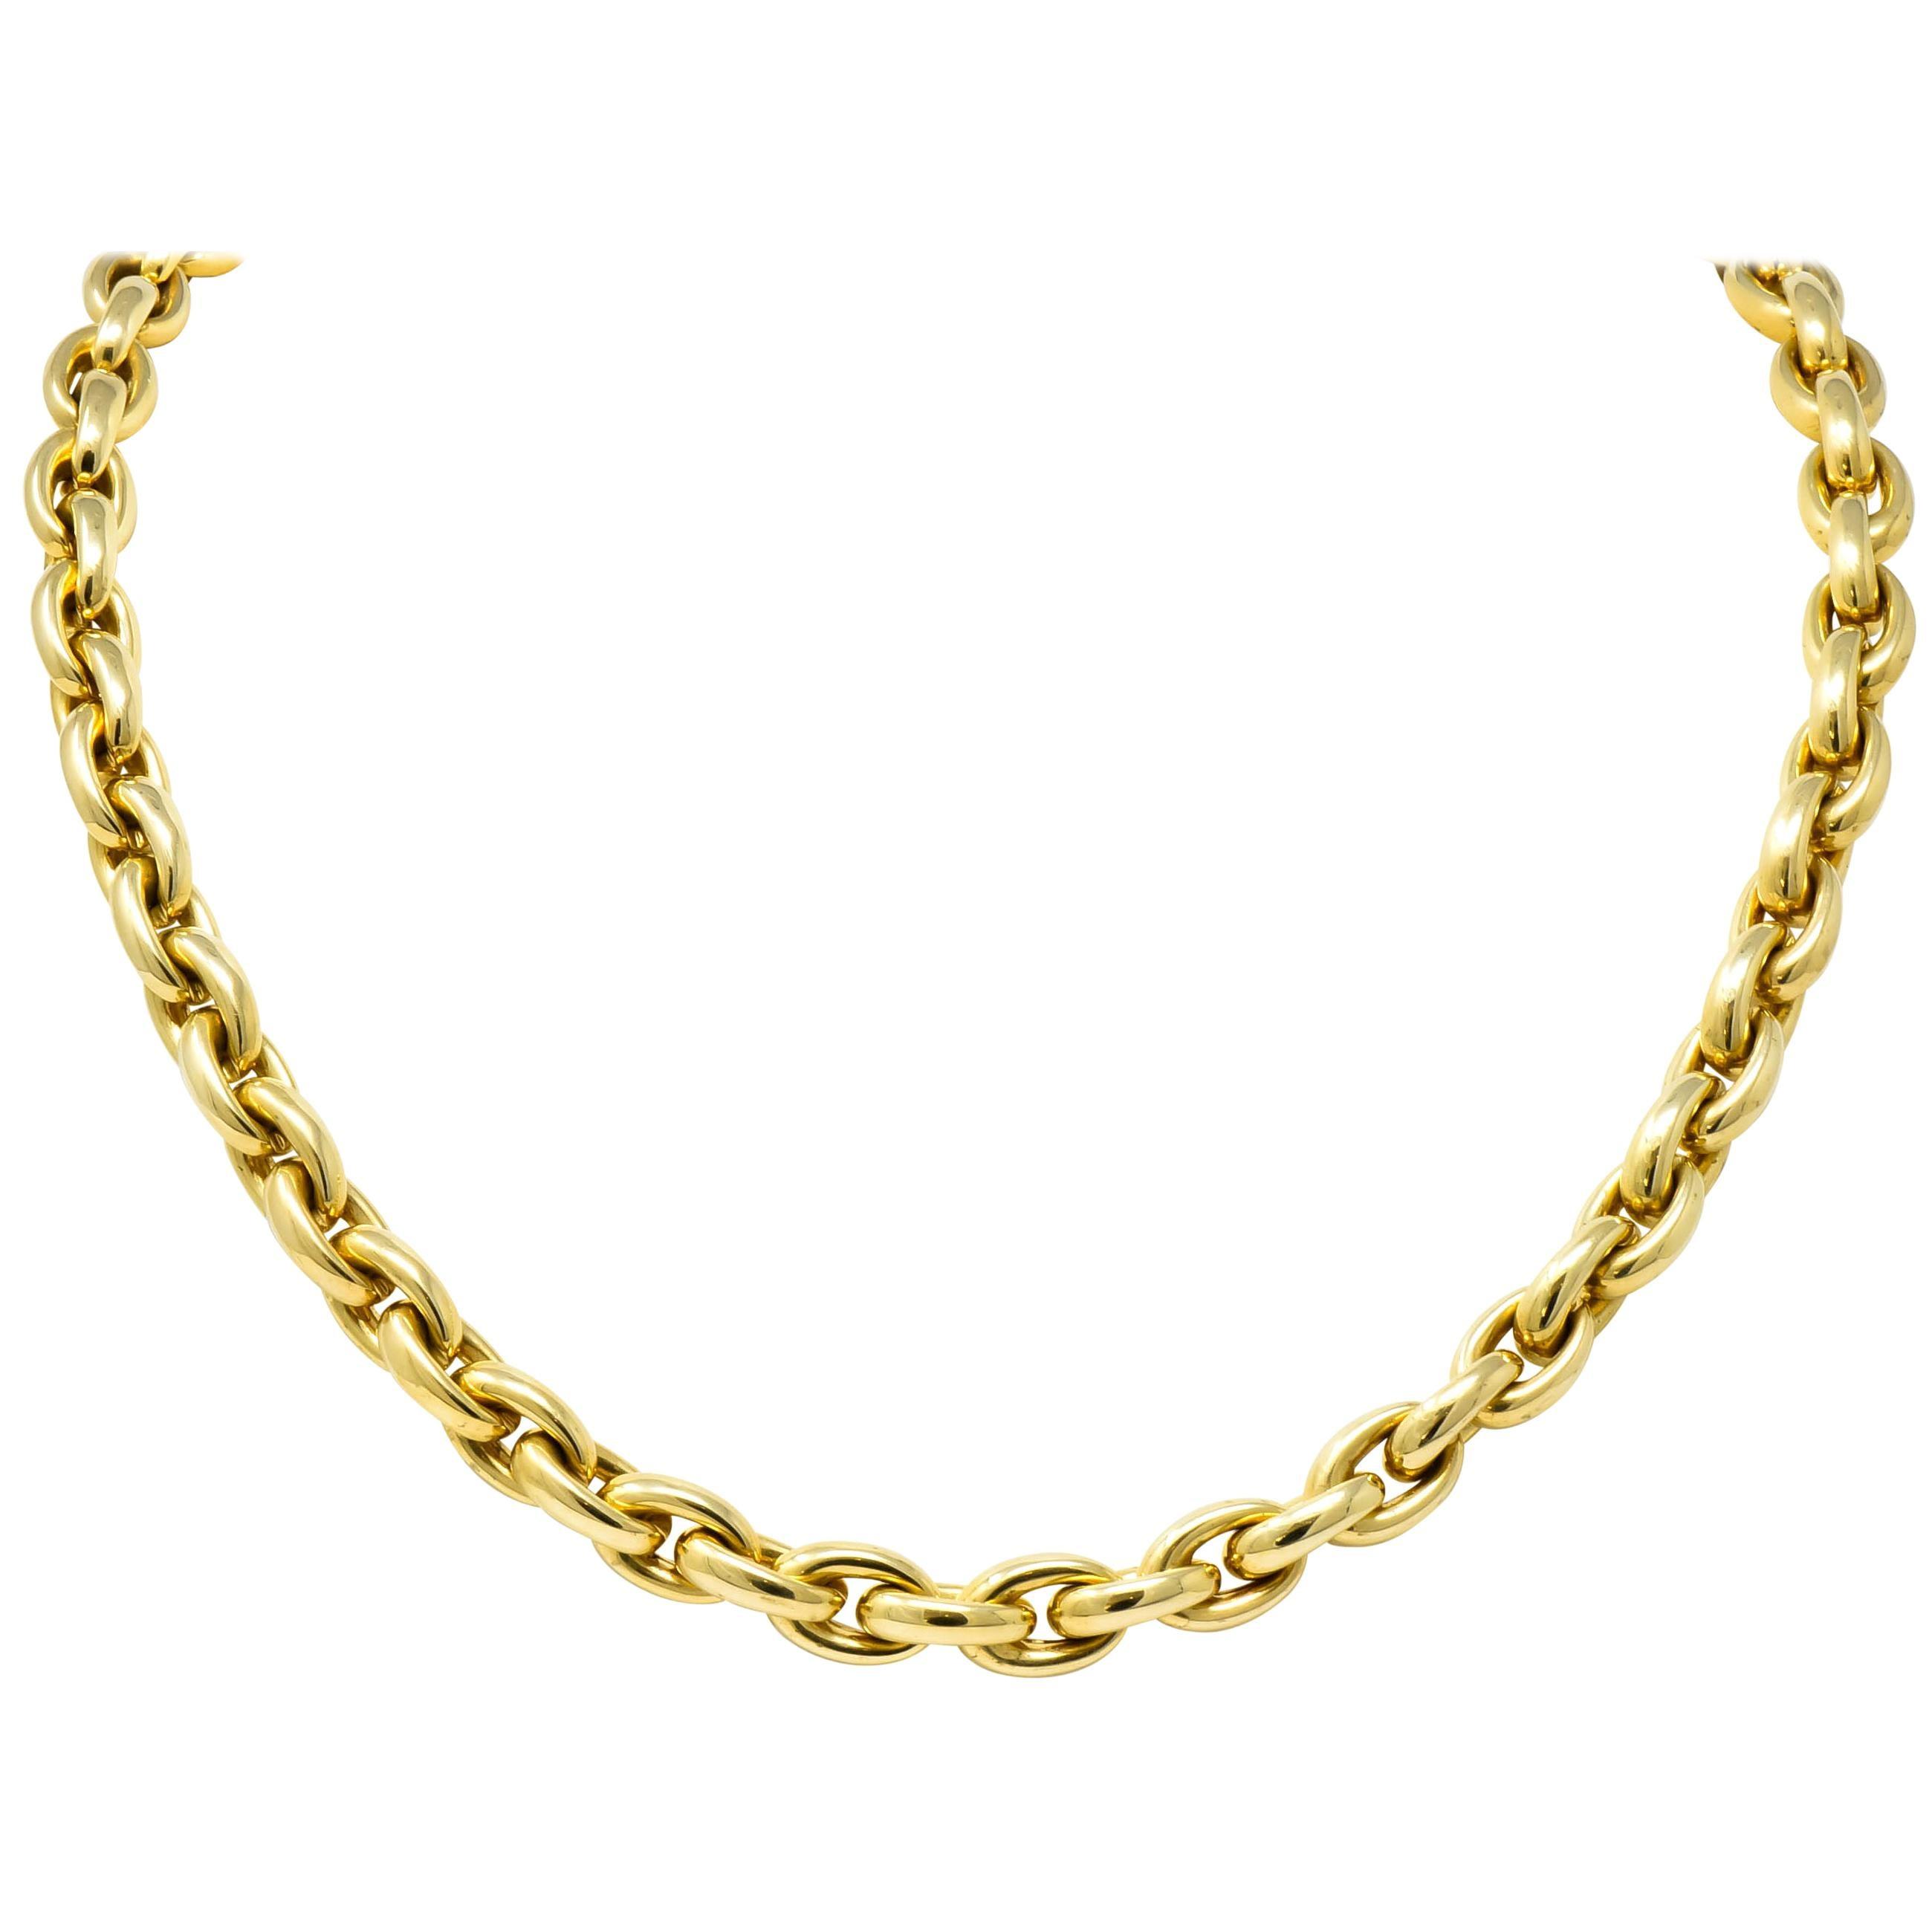 Contemporary Italian 14 Karat Yellow Gold Mariner Link Necklace